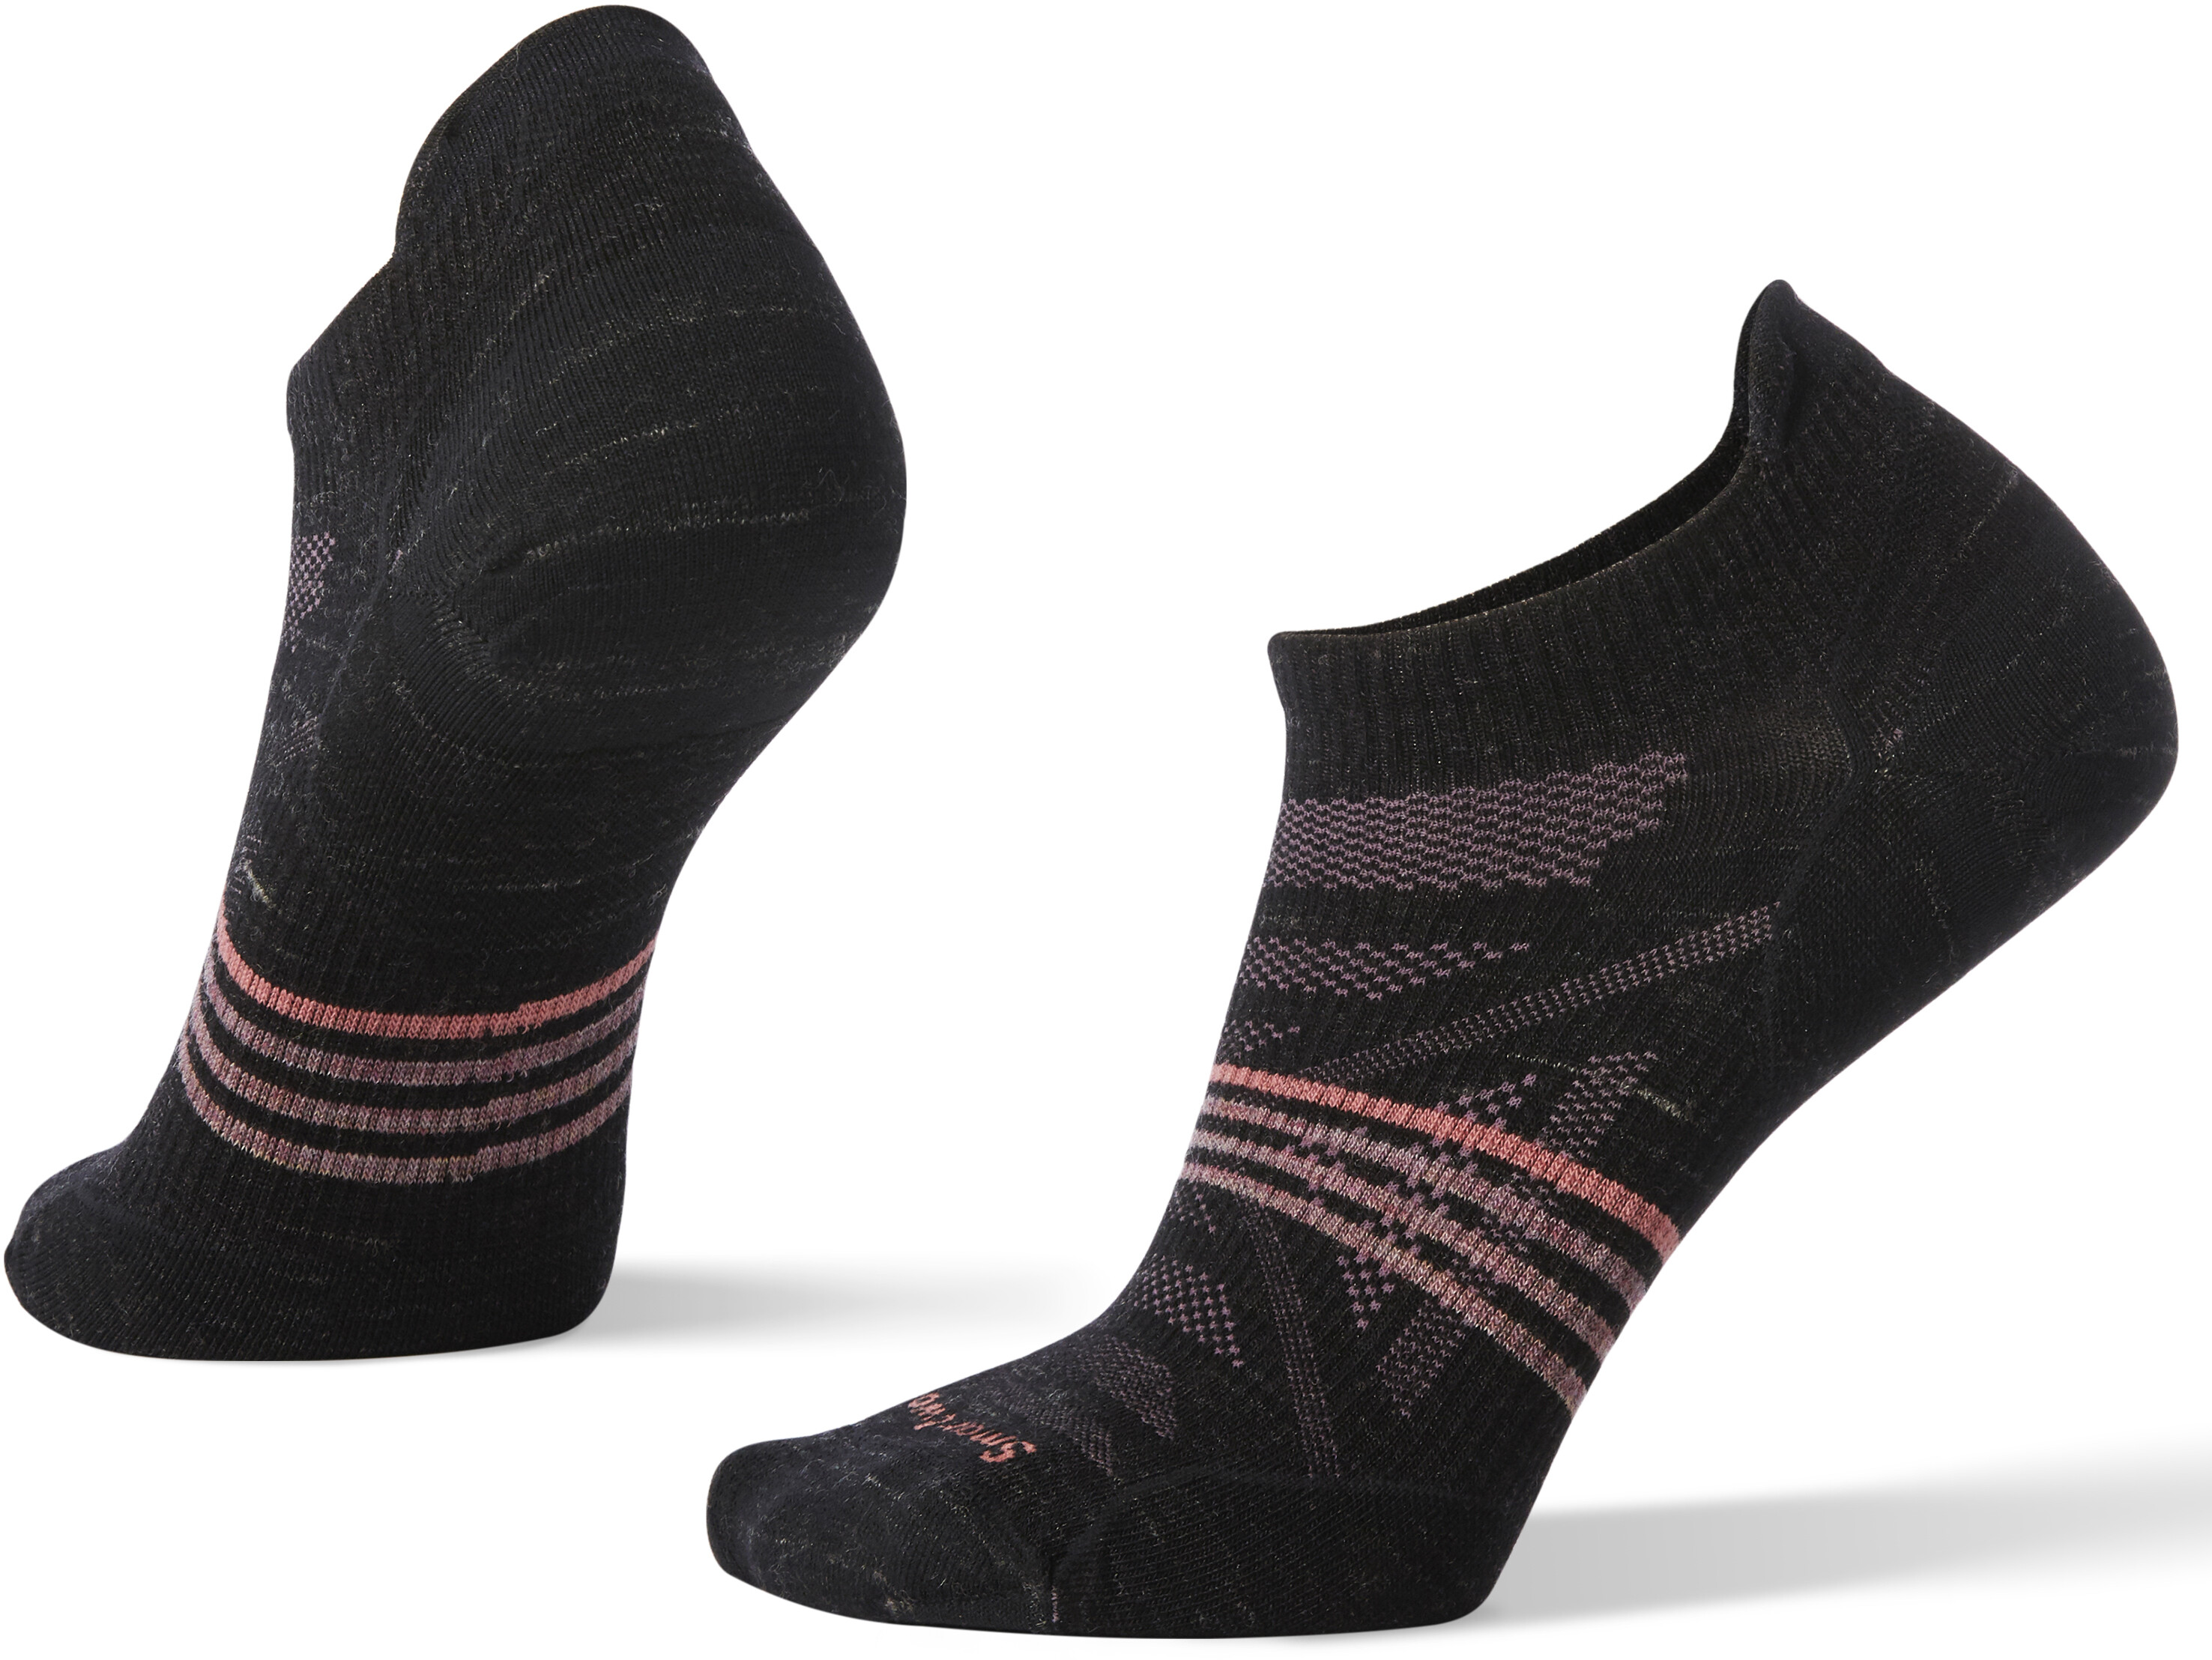 Smartwool Phd Outdoor Ultra Light Micro Socks Women Black